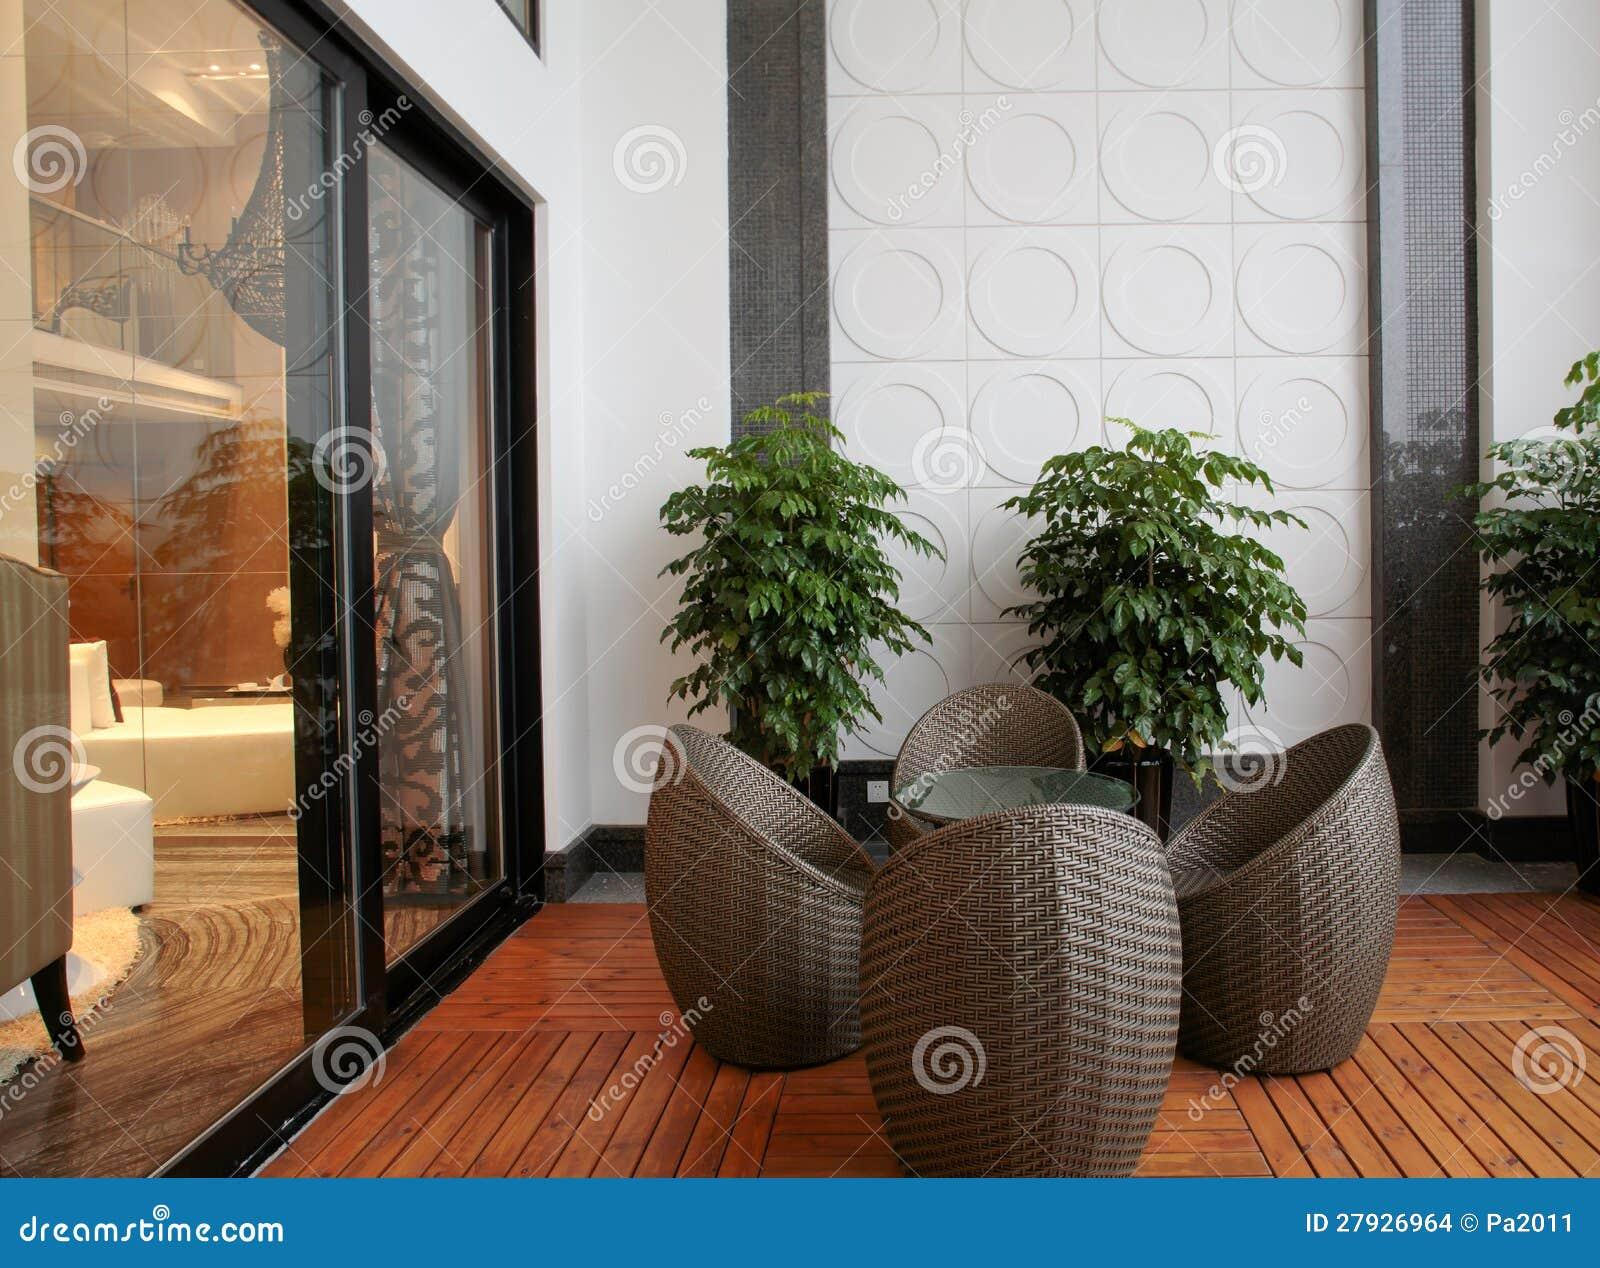 moderne innenarchitektur wohnzimmer stockbilder bild 27926964. Black Bedroom Furniture Sets. Home Design Ideas